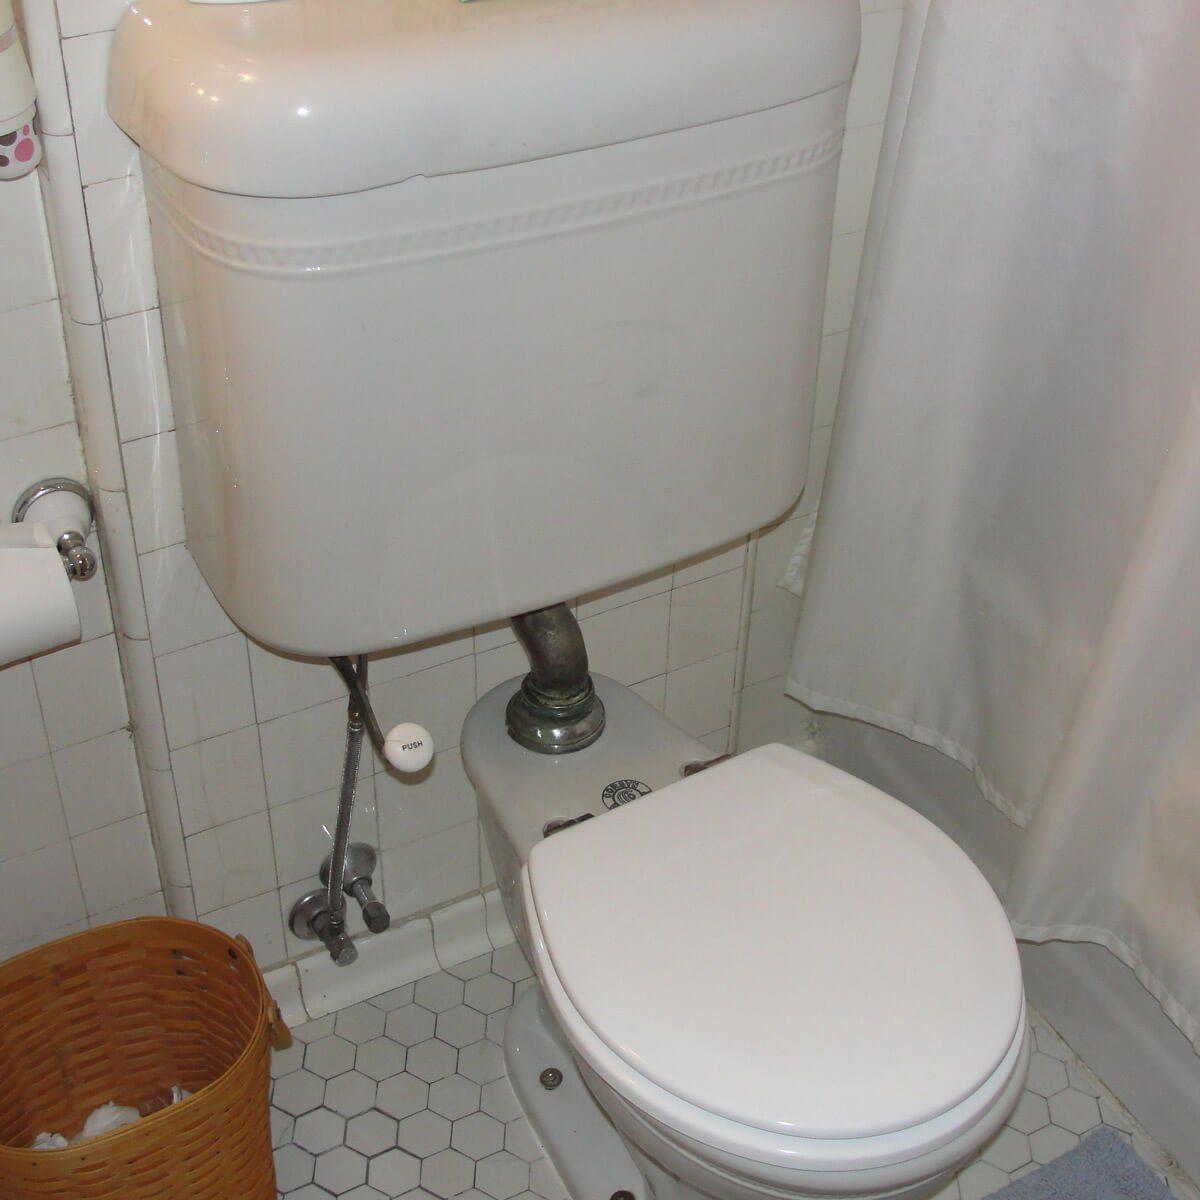 Old-toilet-2